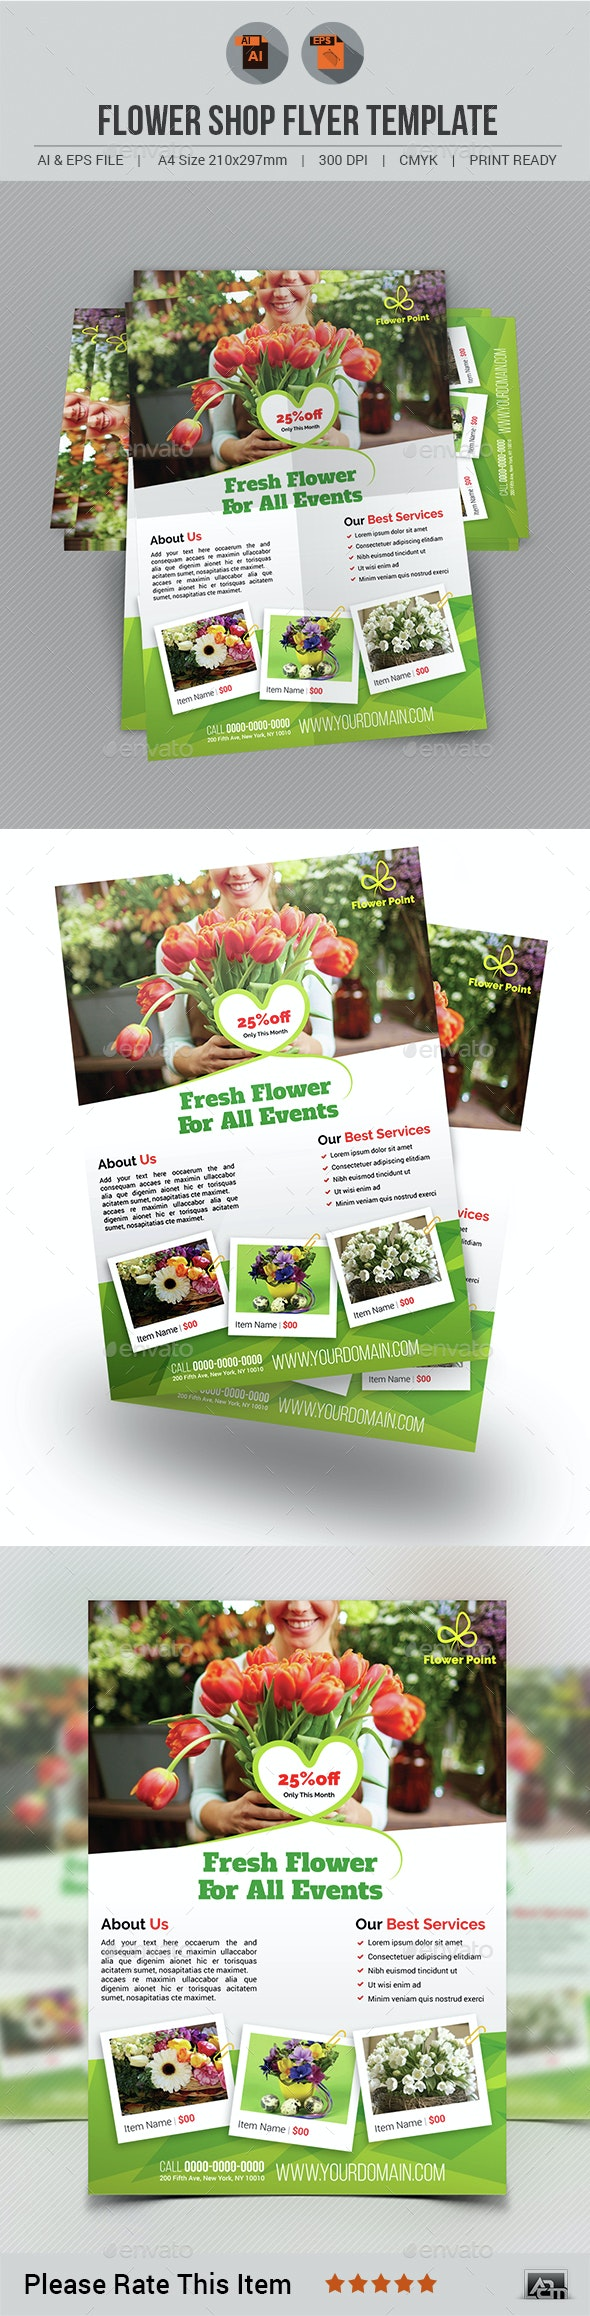 Flower Shop Flyer Template - Commerce Flyers